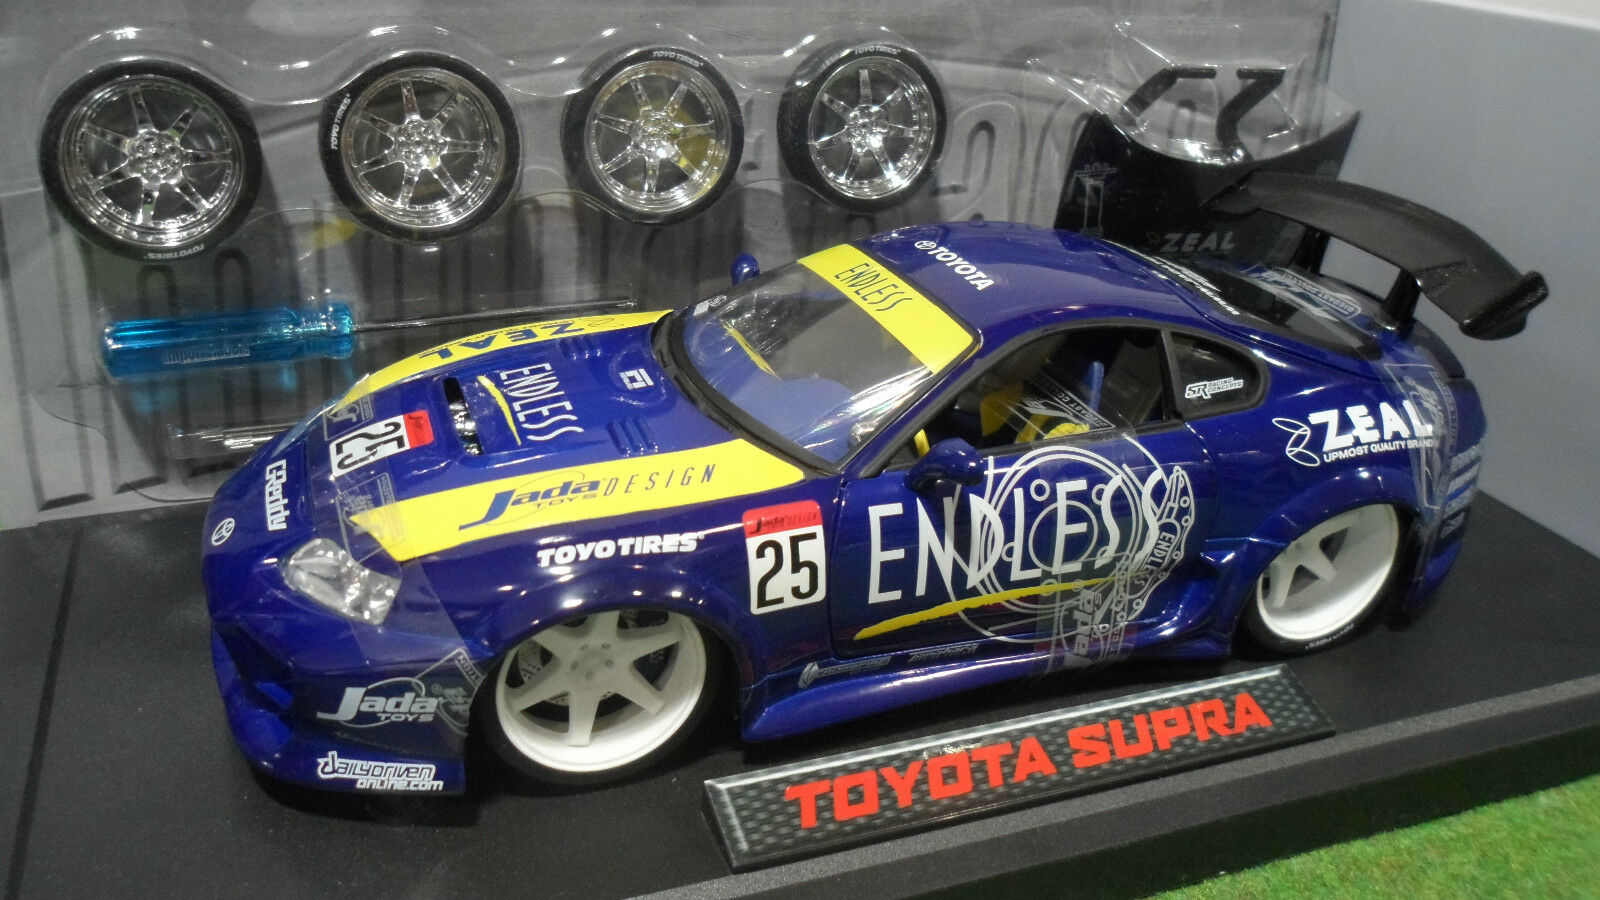 TOYOTA SUPRA TUNING Bleu 1 18 JADATOYS IMPORT RACER 63004 voiture